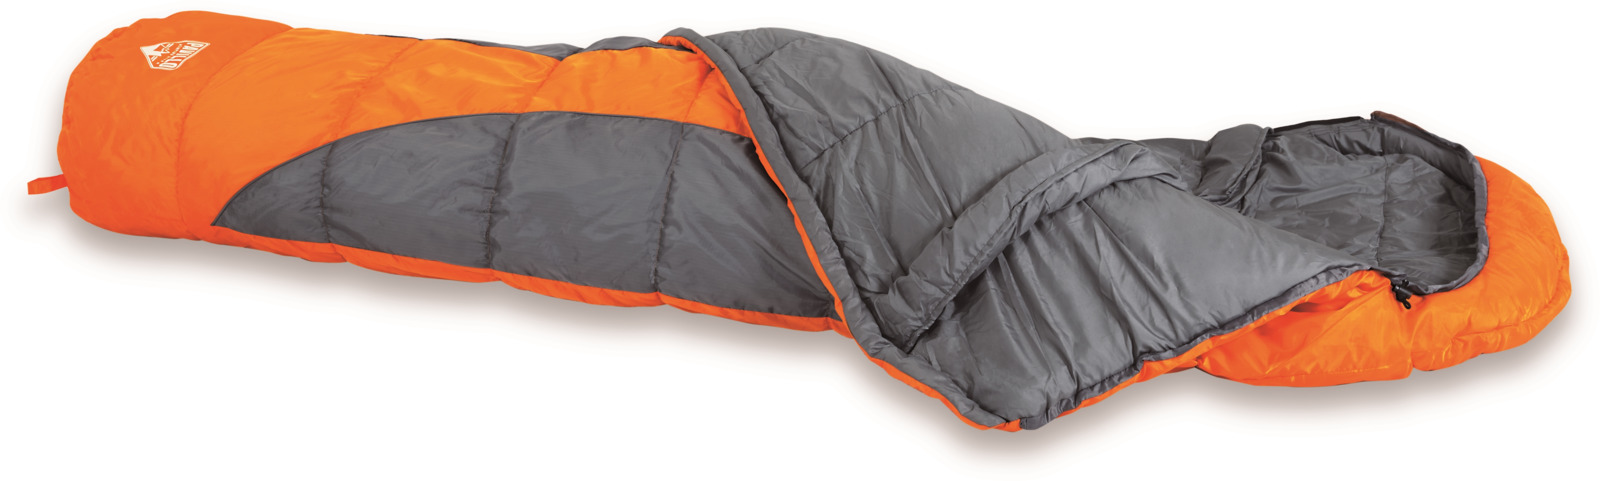 Спальный мешок Bestway HeatWrap300, 230 х 80 х 55 см